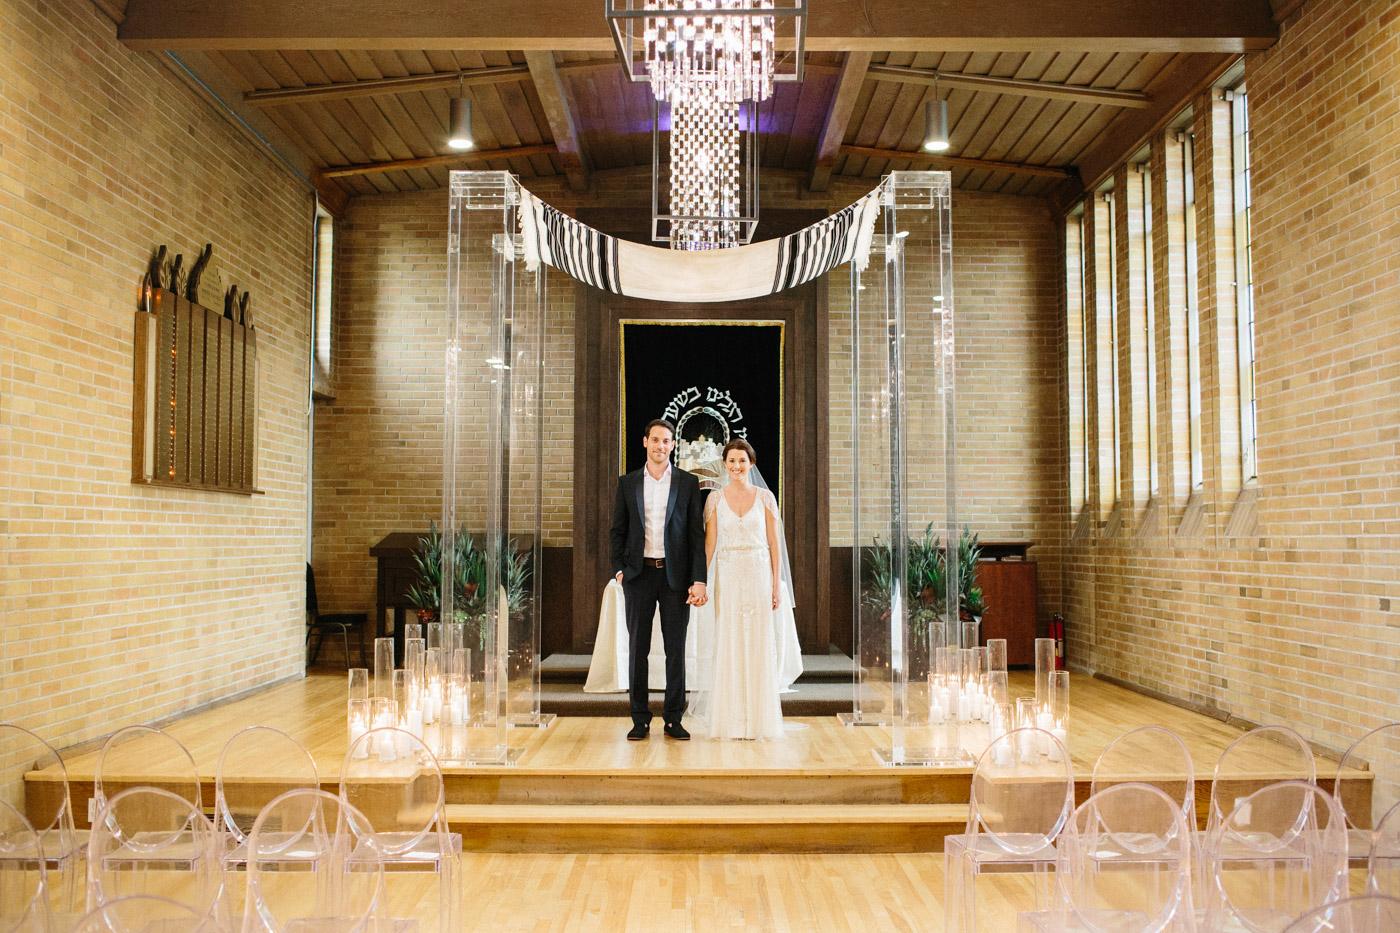 toronto_wedding_photographer_the_great_hall-52.jpg